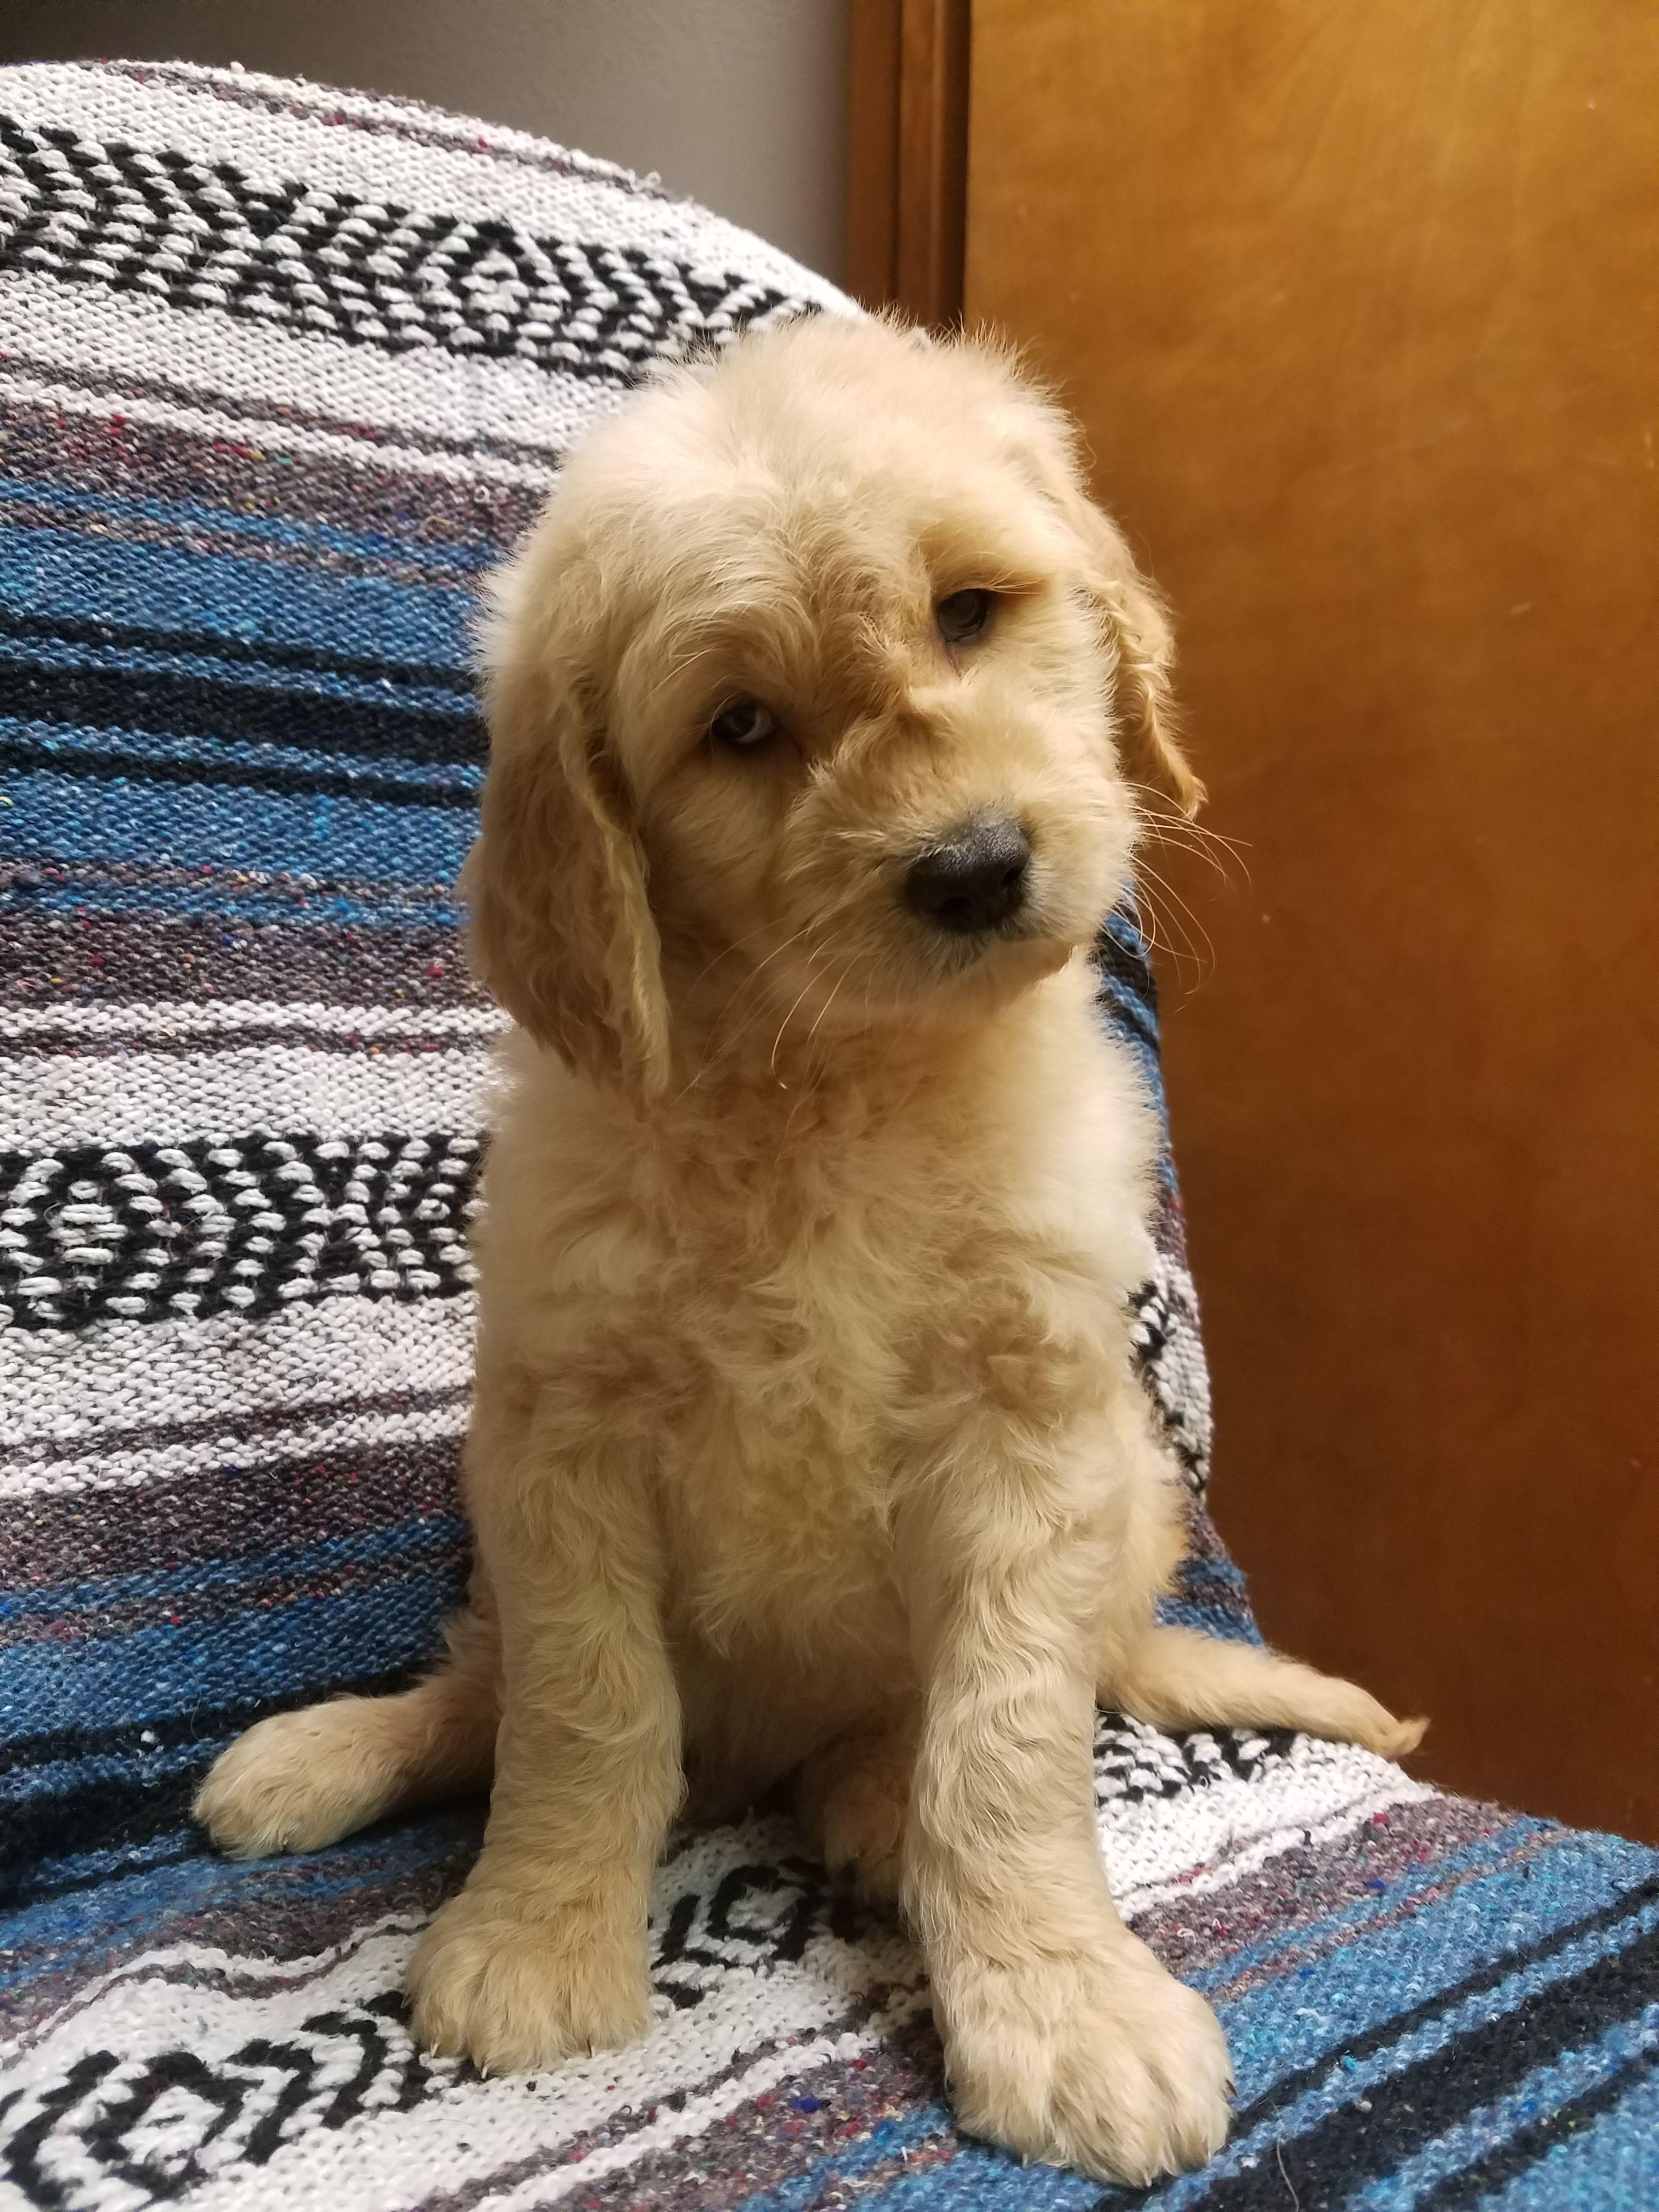 F1 Goldendoodle Puppies Goldendoodle puppy, Goldendoodle